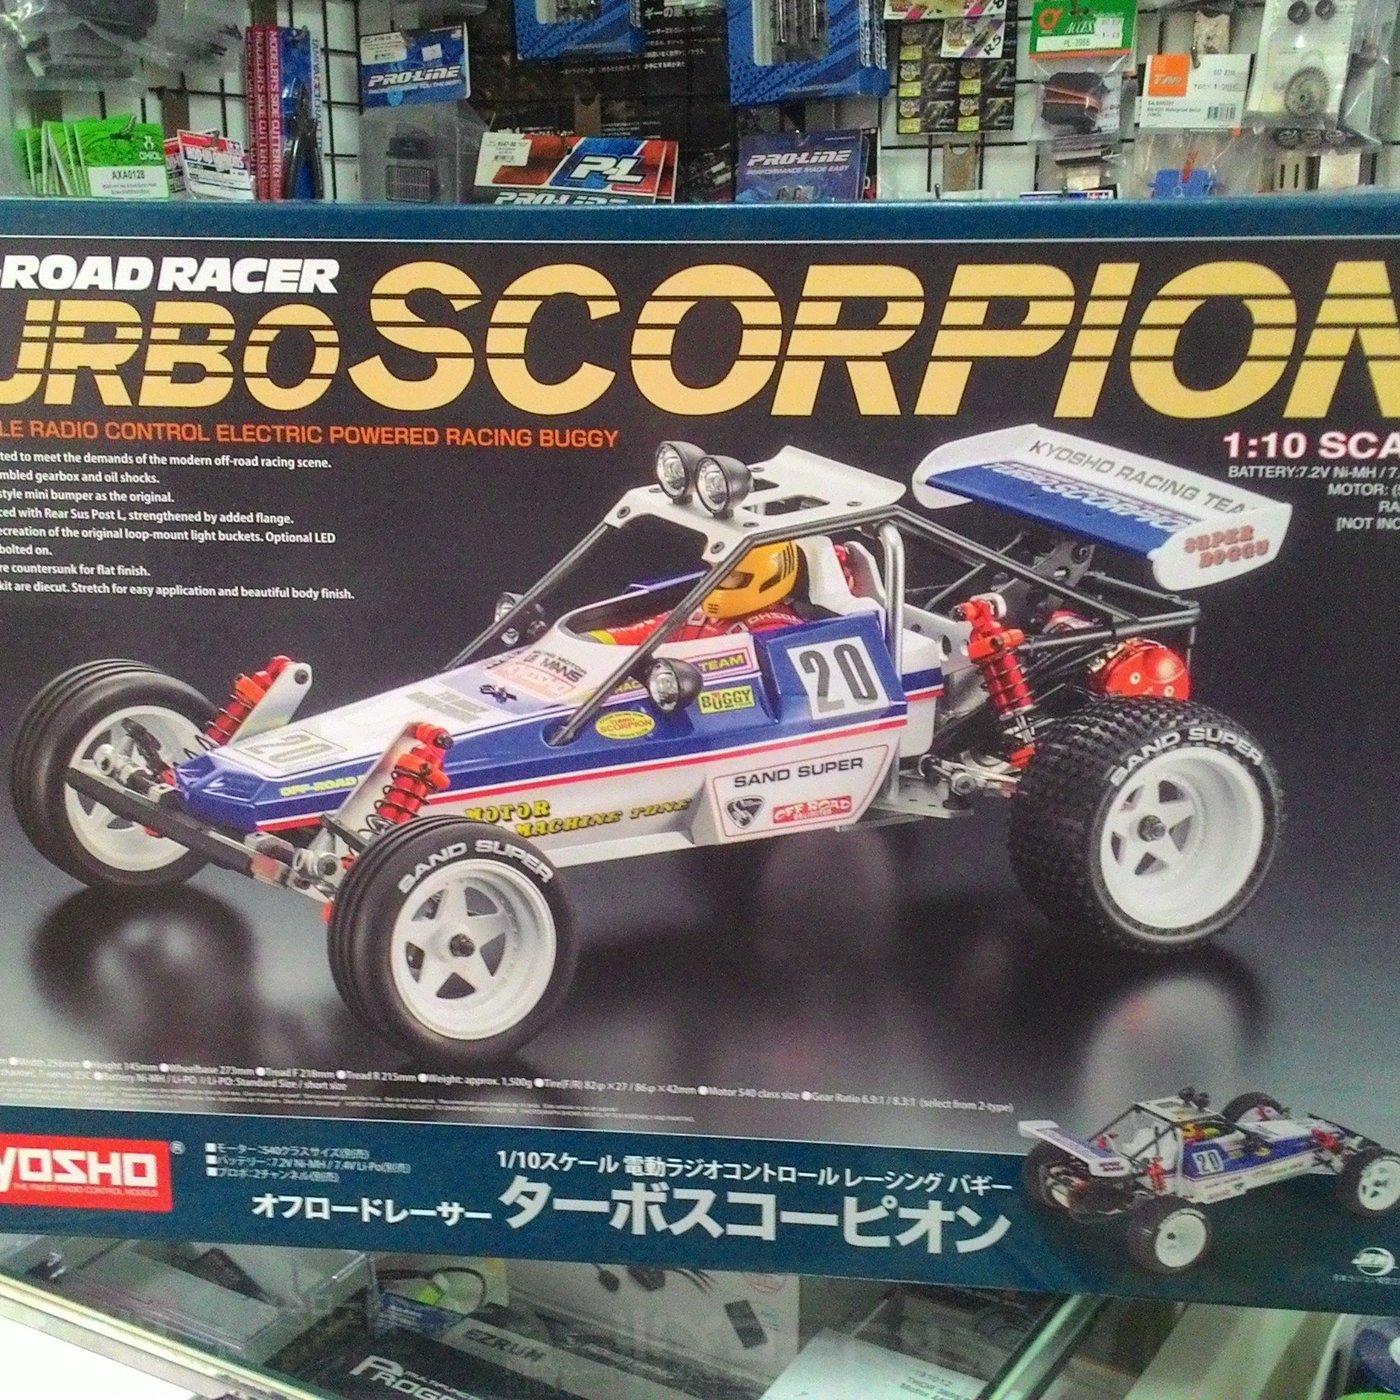 Kyosho 30616 1:10 Turbo Scorpion Kit RC Buggy Electric Powered